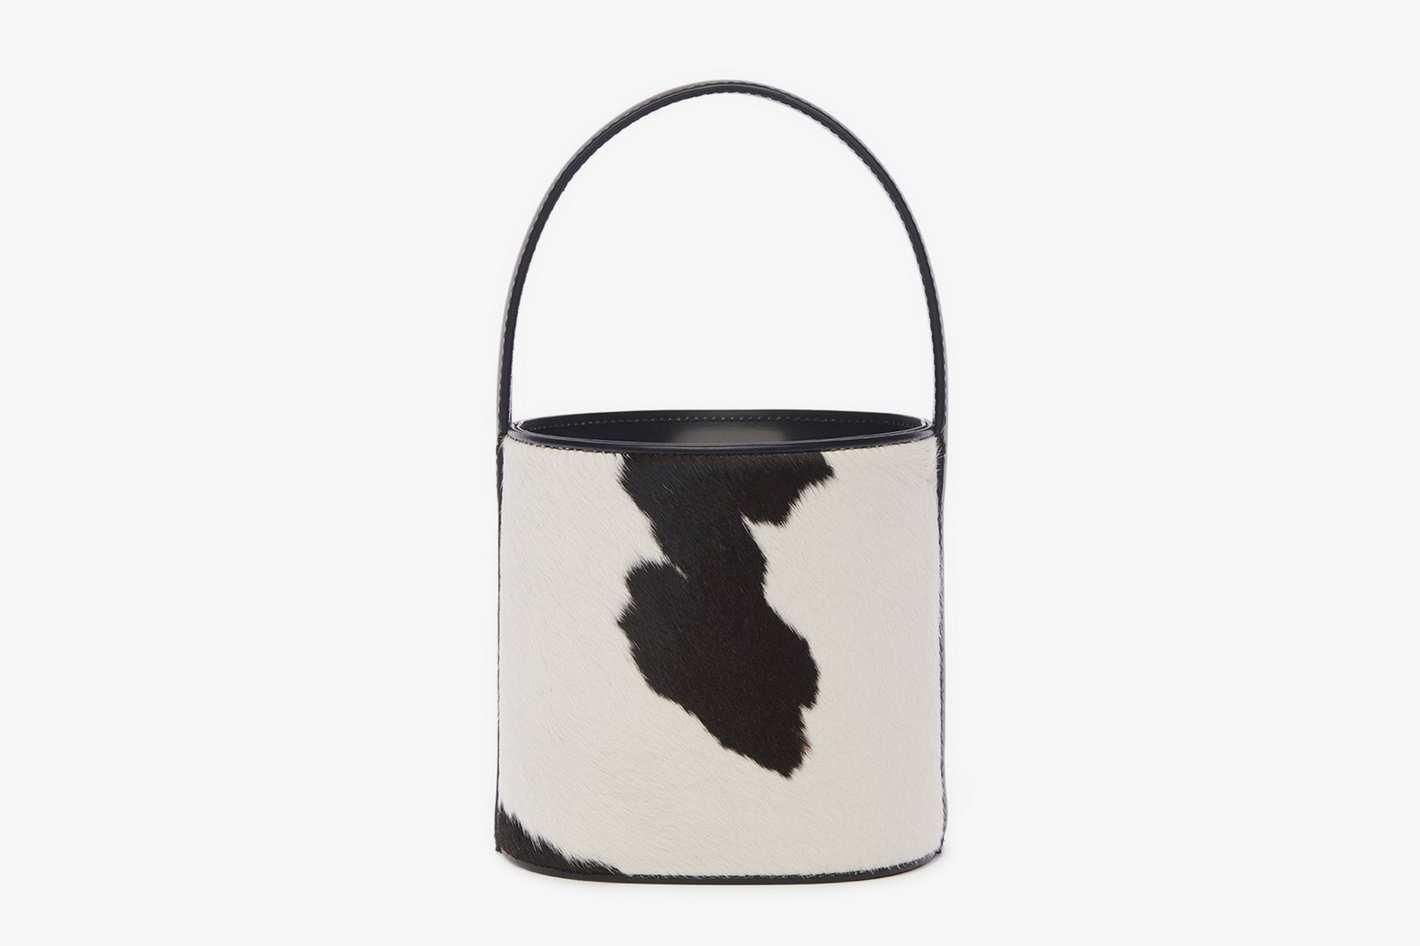 Staud Bissett Bag in Cow Print